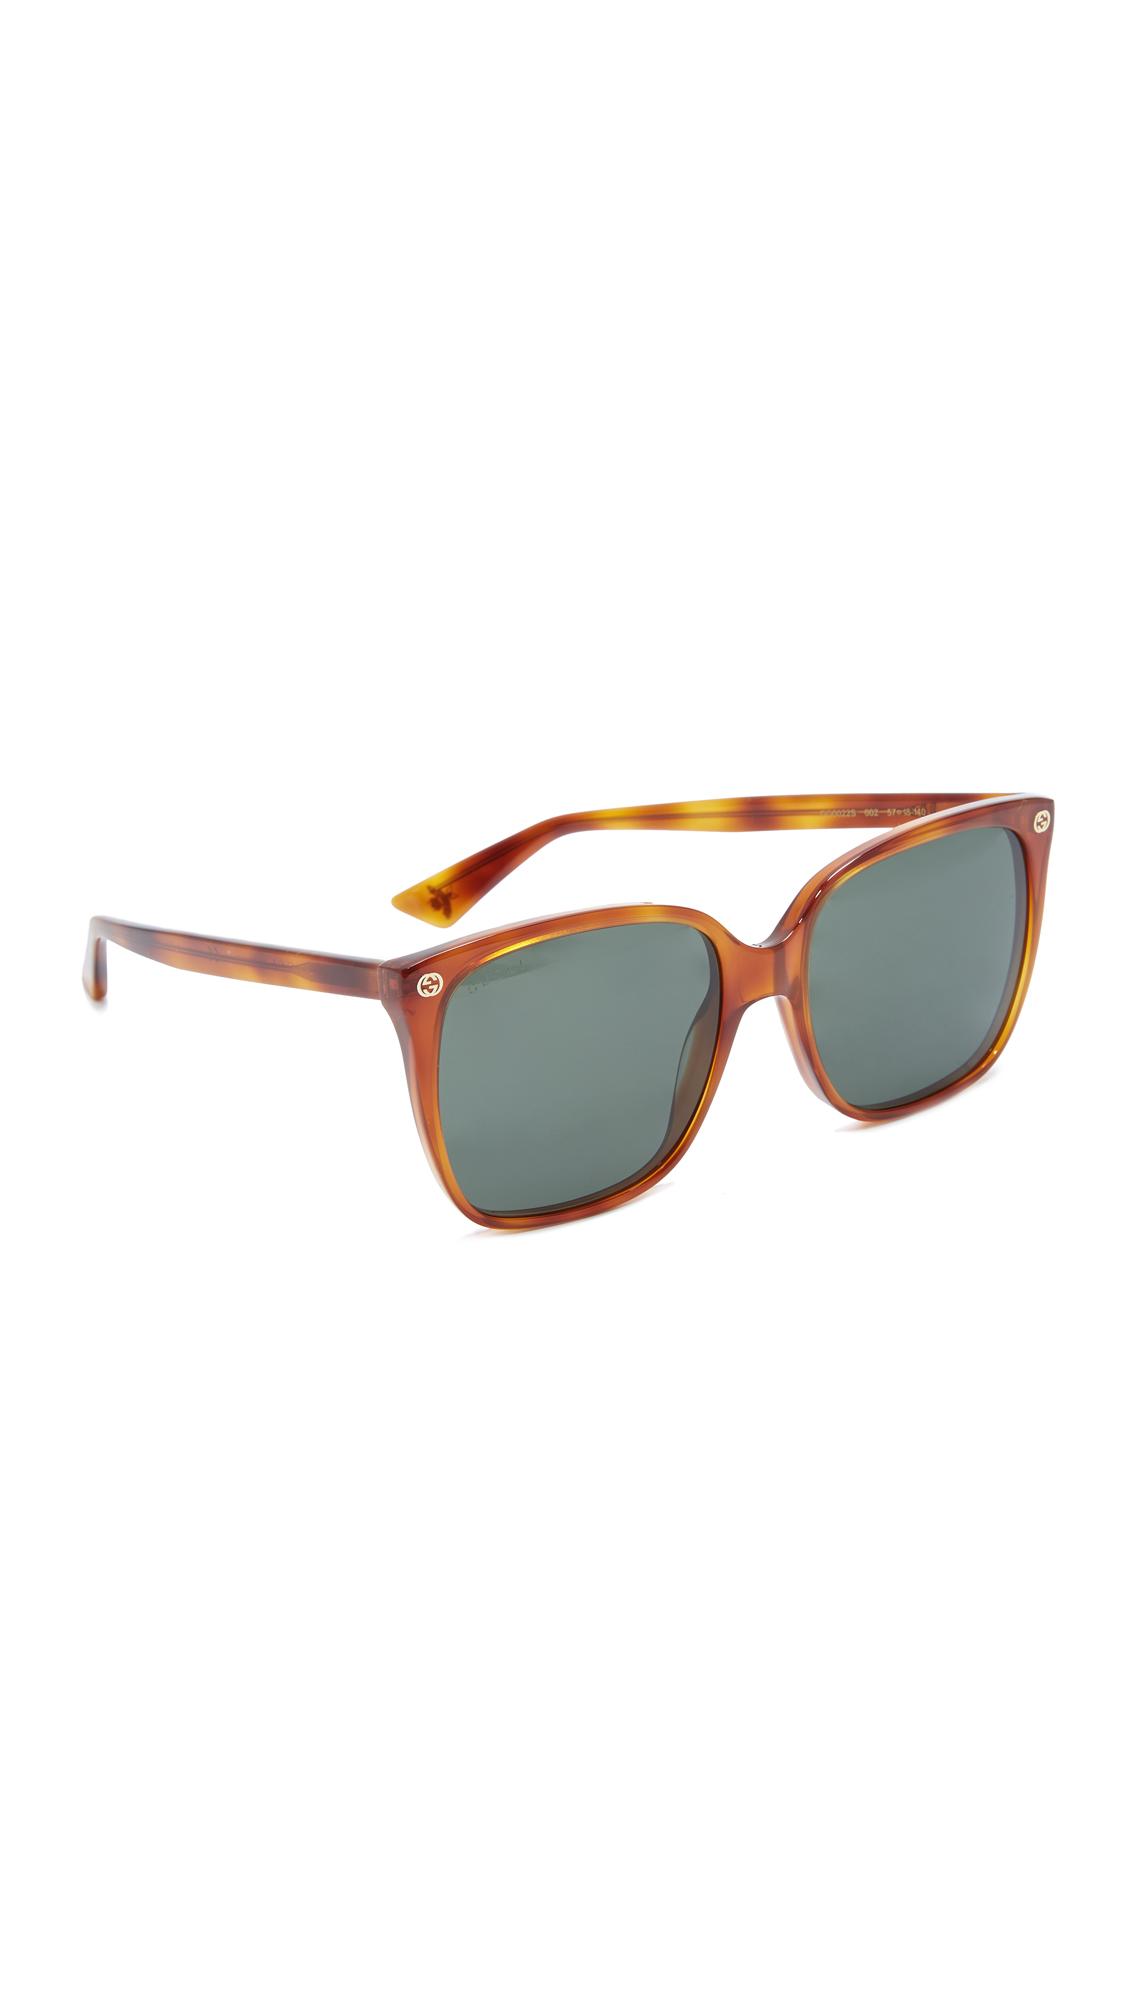 Gucci Lightness Square Sunglasses - Blonde Havana/Green at Shopbop